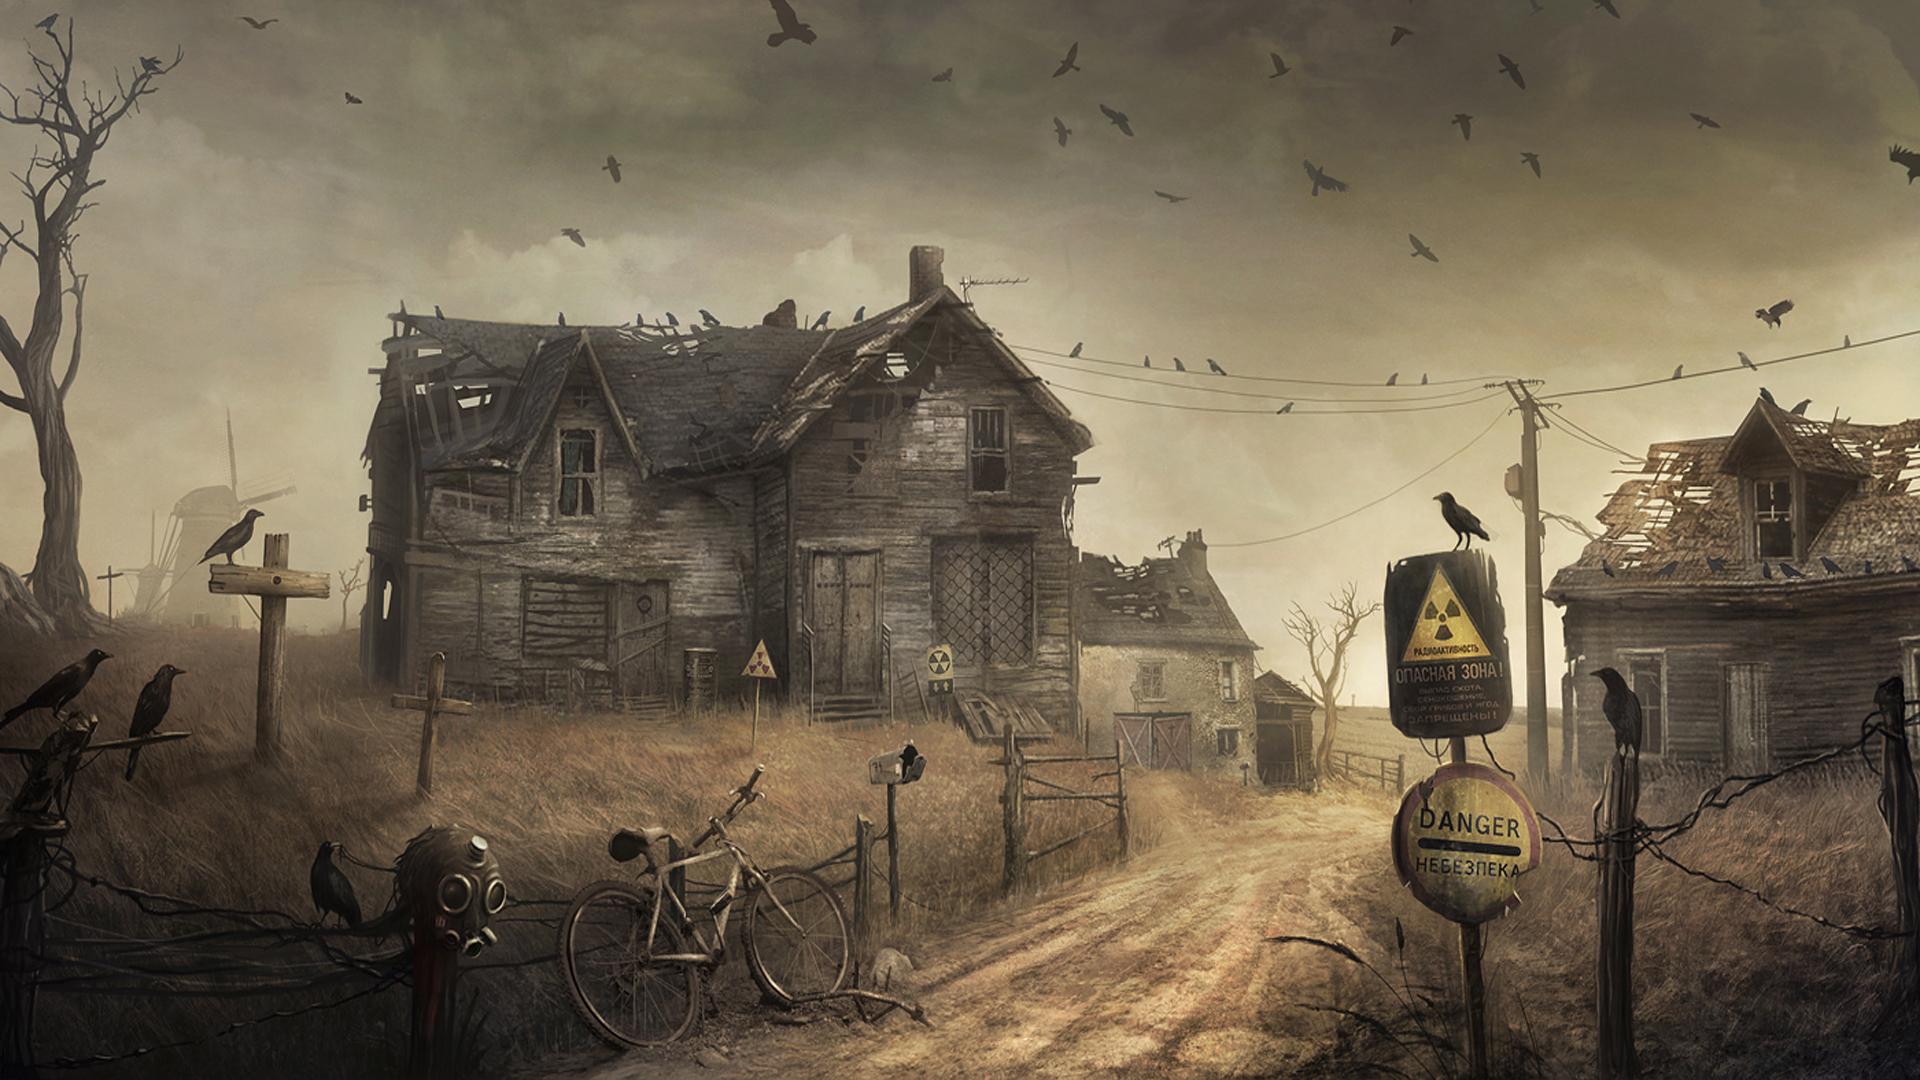 50] Post Apocalypse Wallpaper on WallpaperSafari 1920x1080